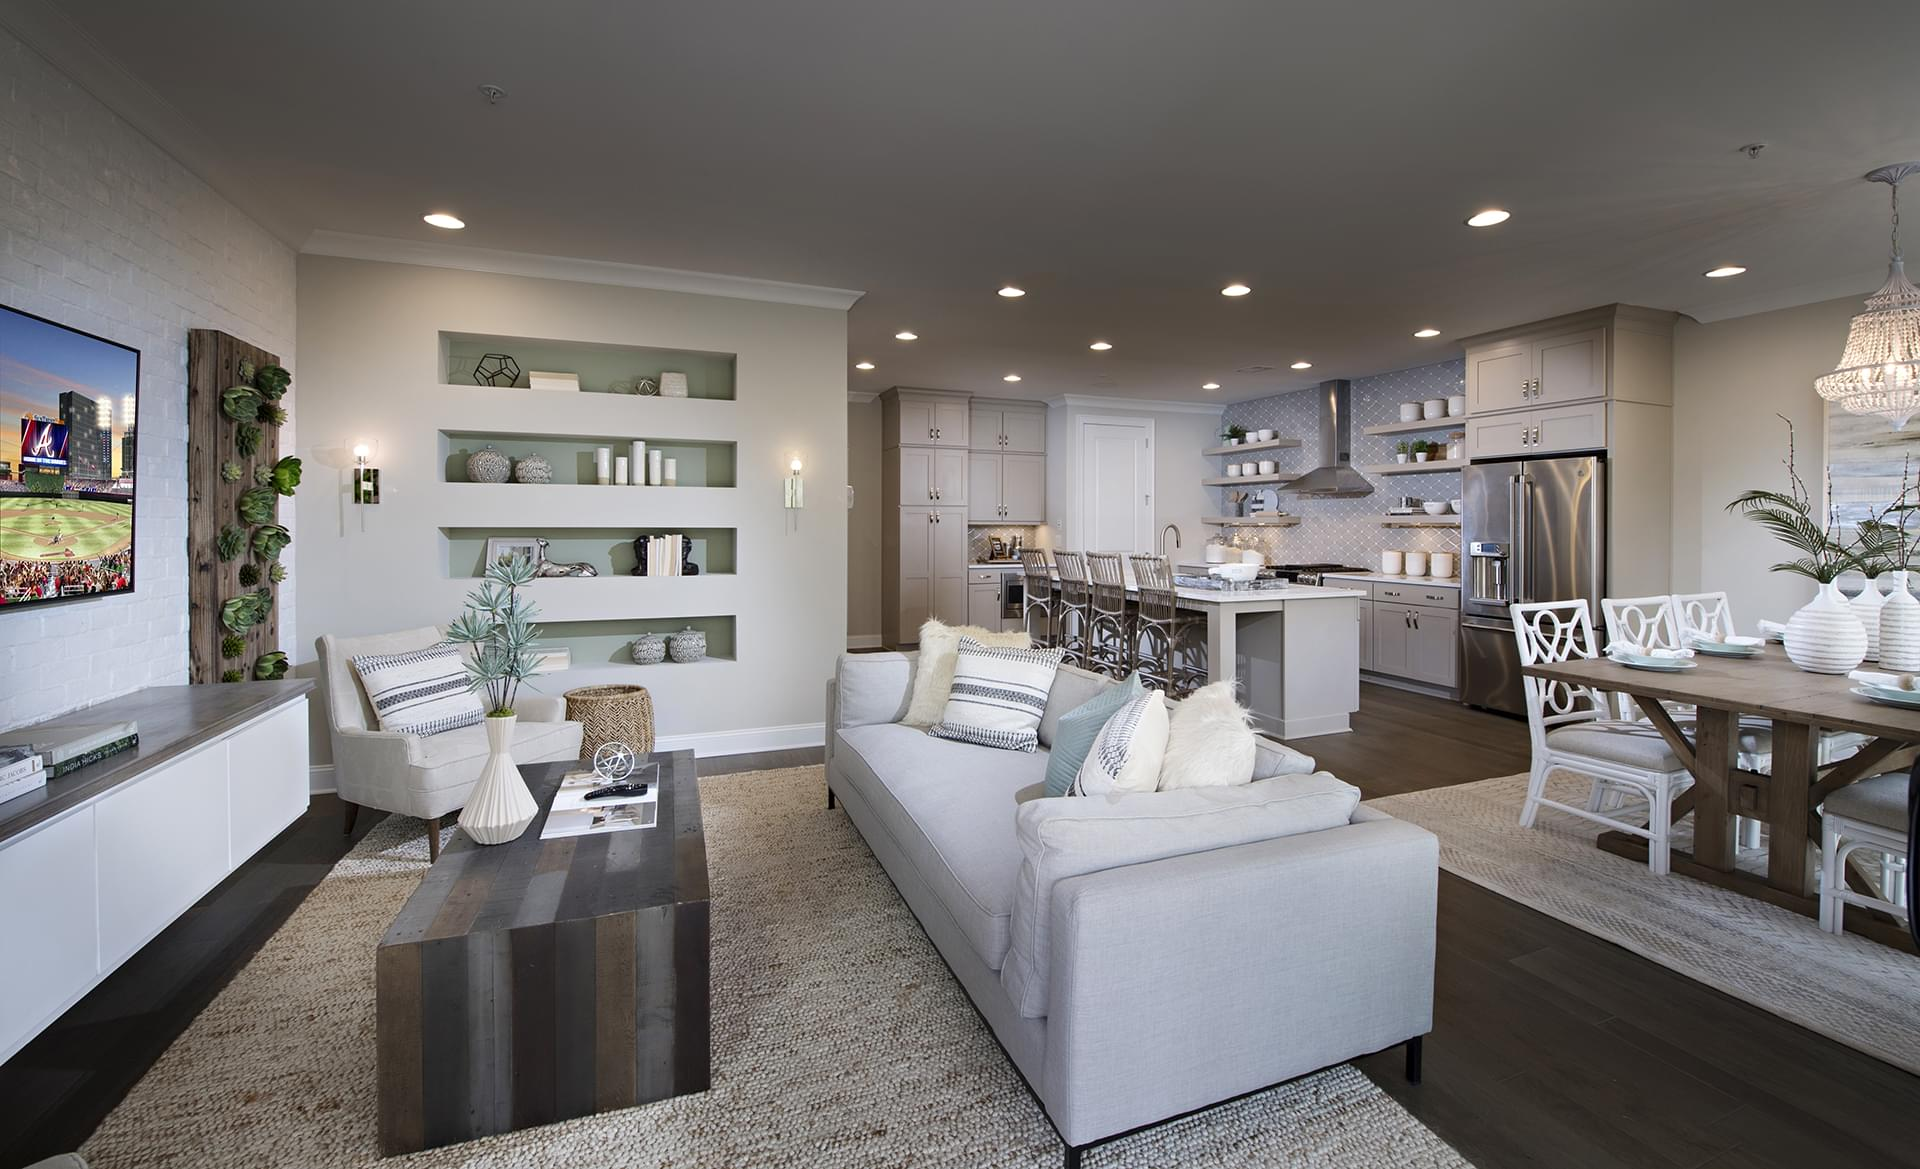 The Stockton New Home in Suwanee GA